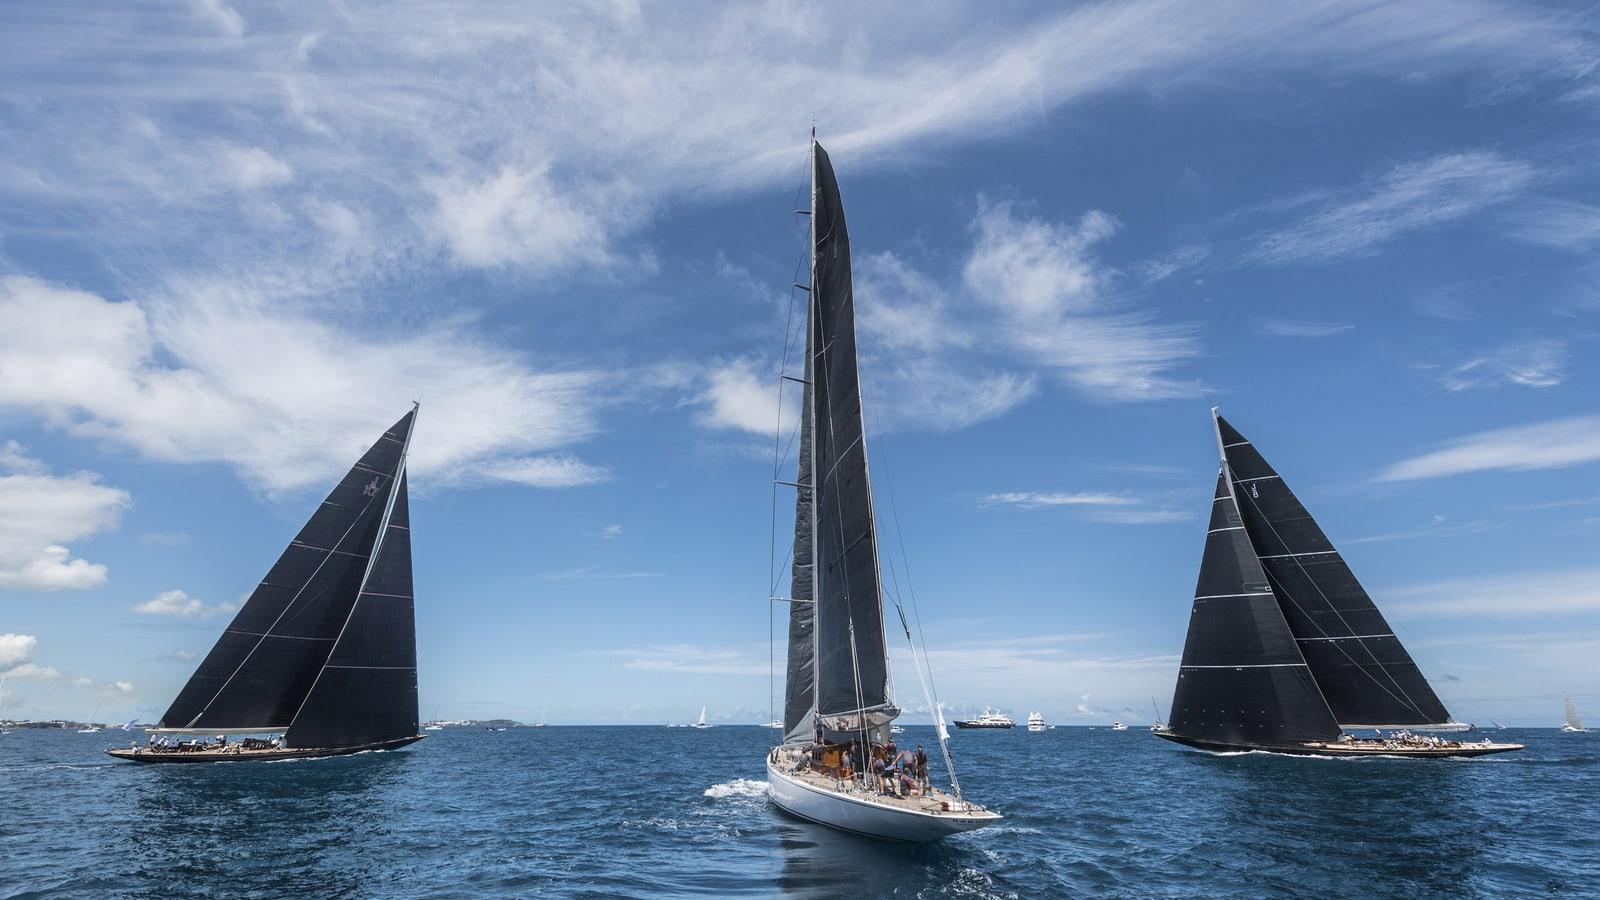 America's Cup Superyacht Regatta Bermuda Ricardo Pinto